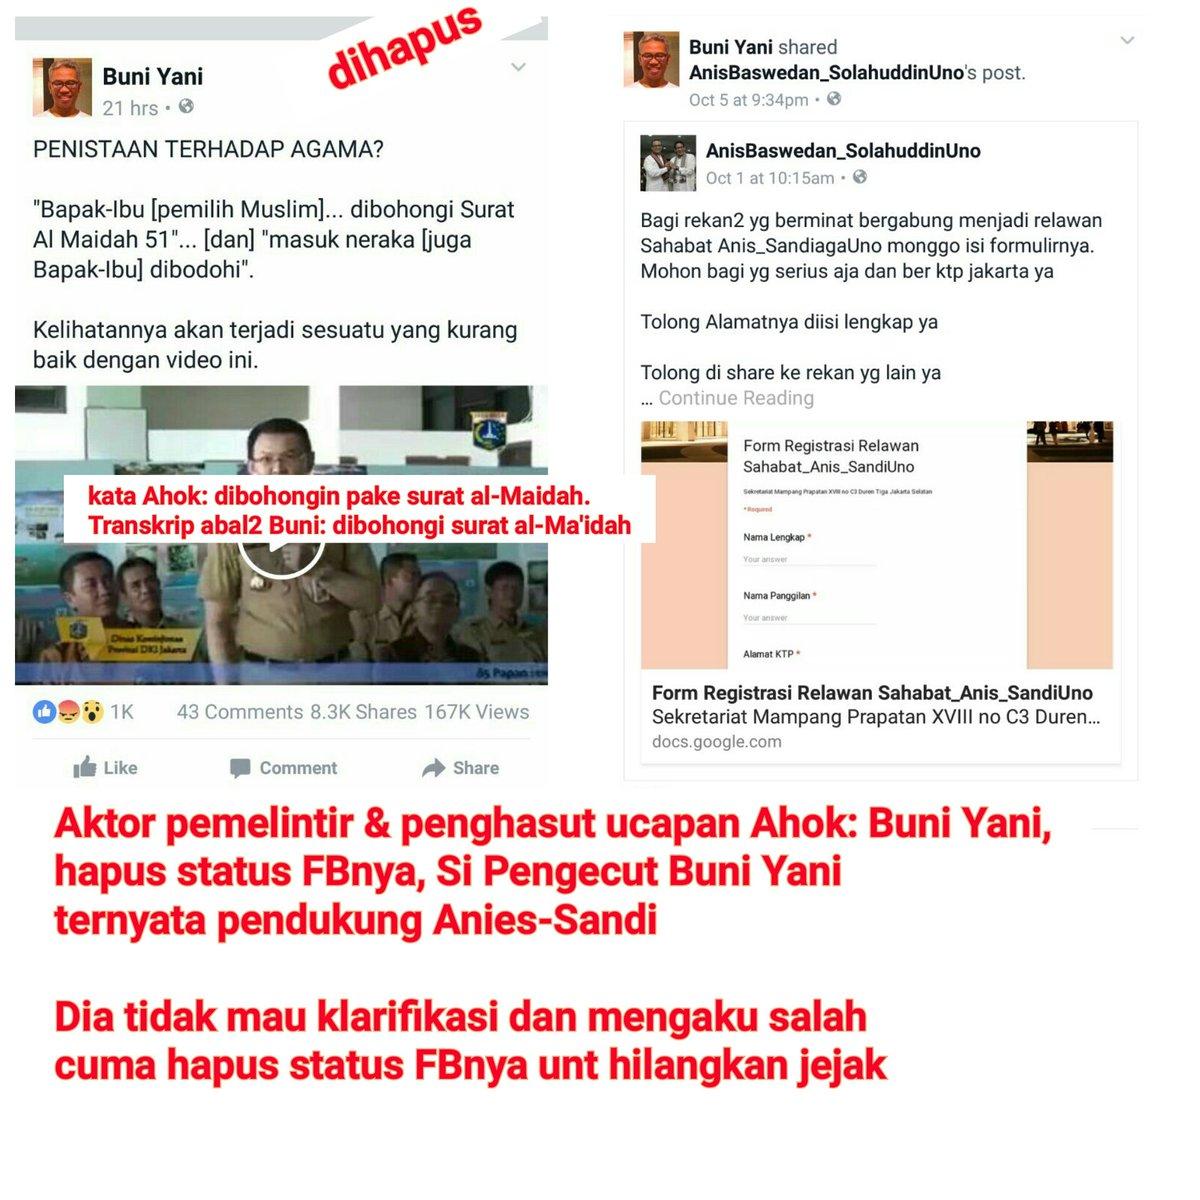 Buni Yani yg pertama kali memlintir & menyebarkan ucapan Ahok, hapus status FBnya https://t.co/7Sl3f9vFjM